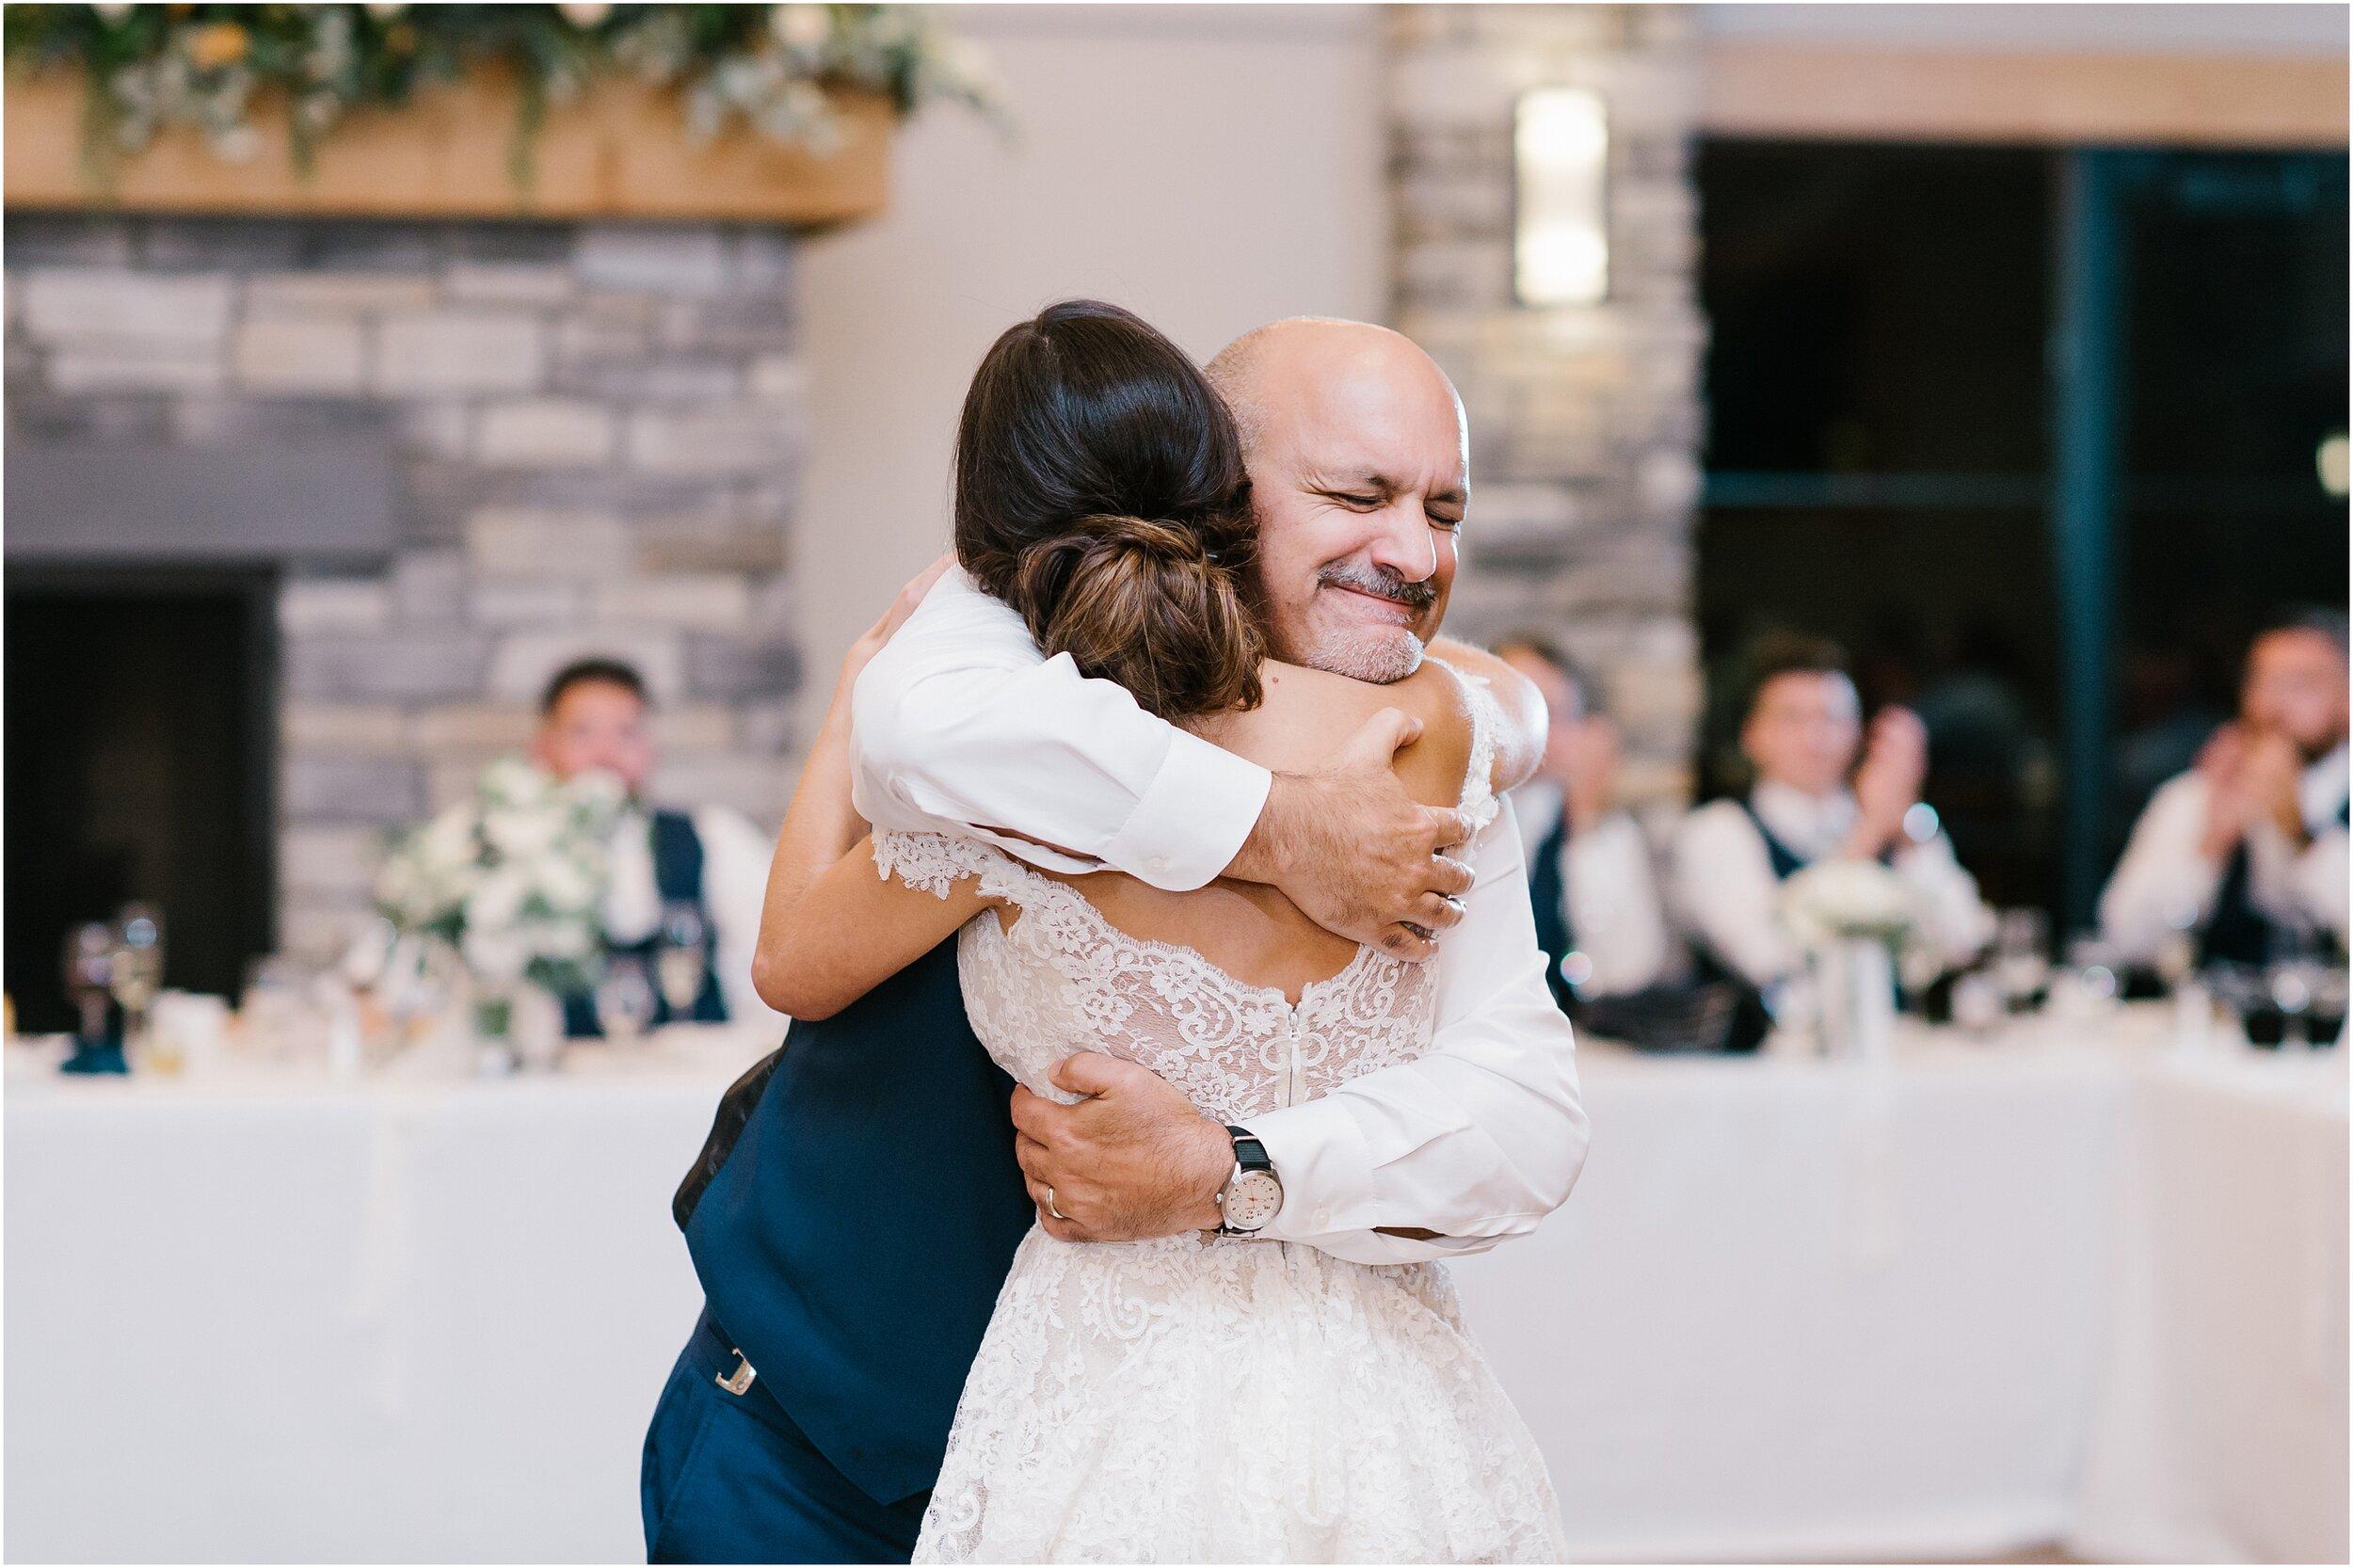 Rebecca Shehorn Photography Indianapolis Wedding Photographer Sycamore at Mallow Run_0780.jpg